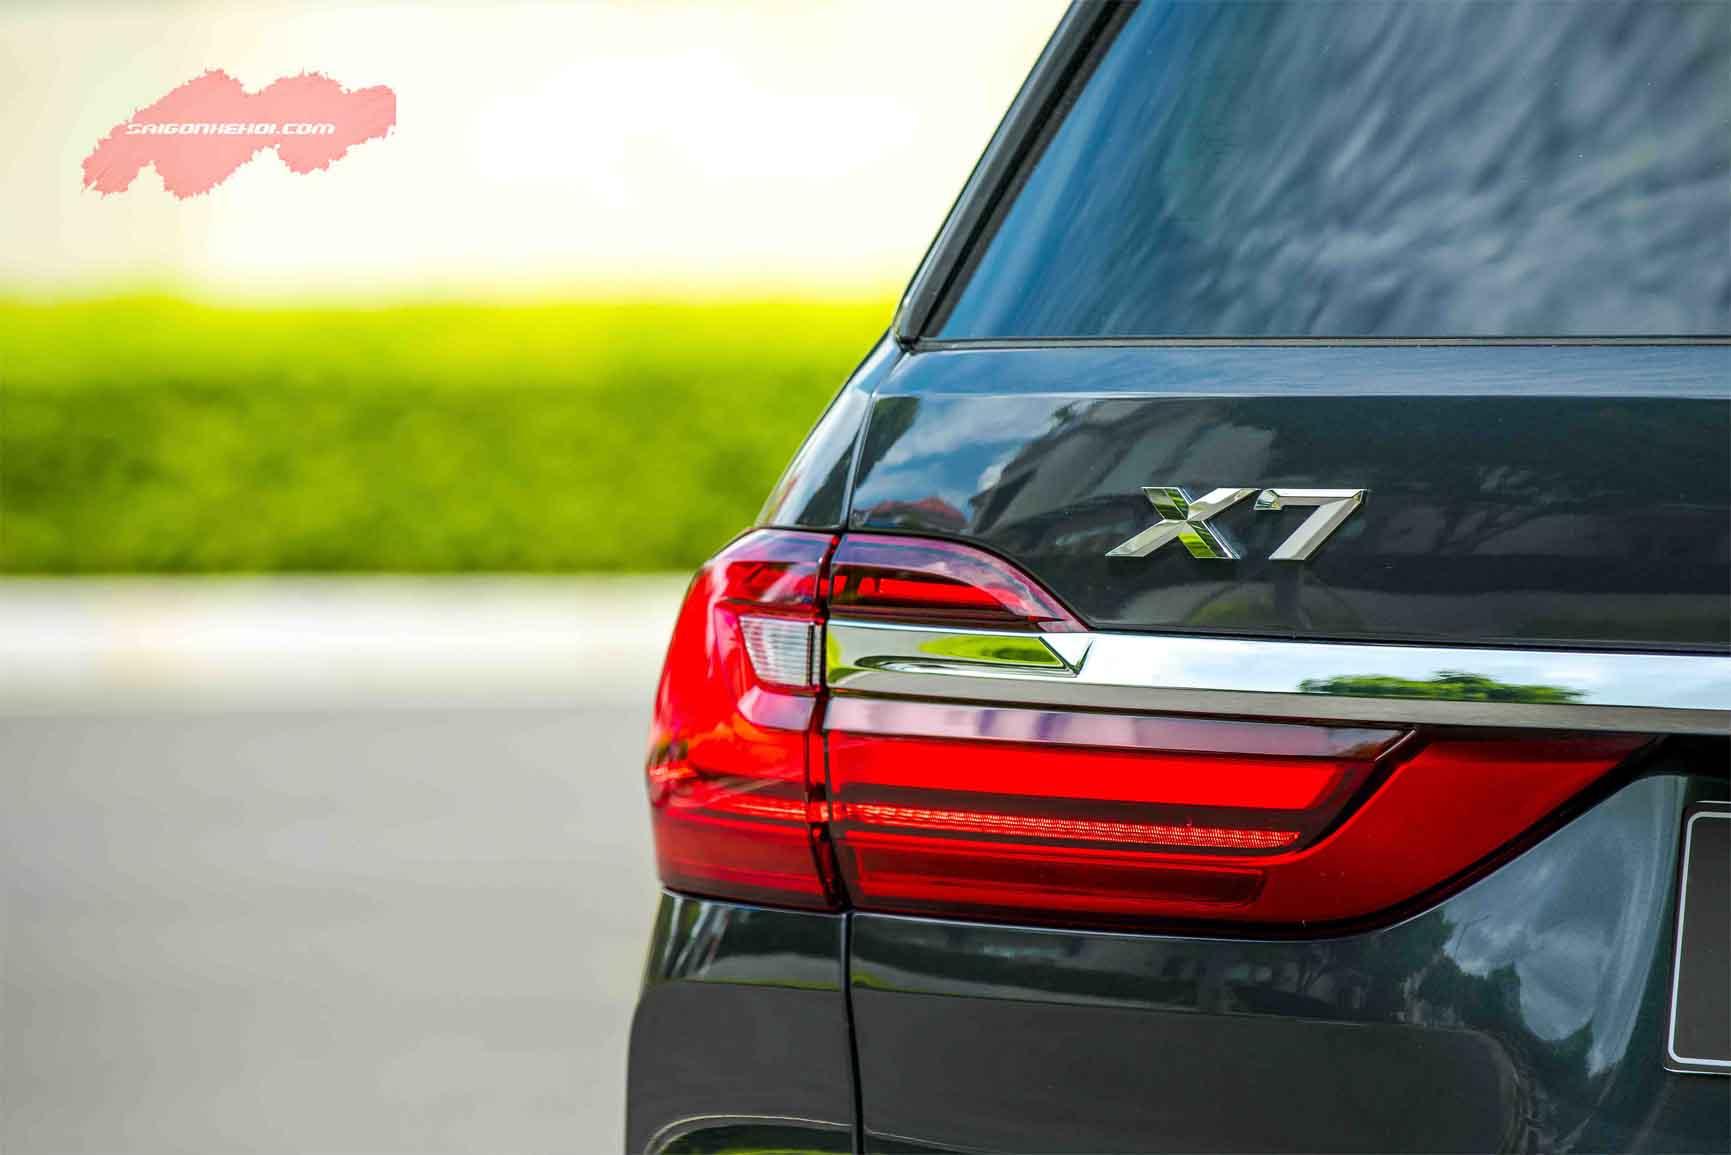 Thiết kế BMW X7 2020